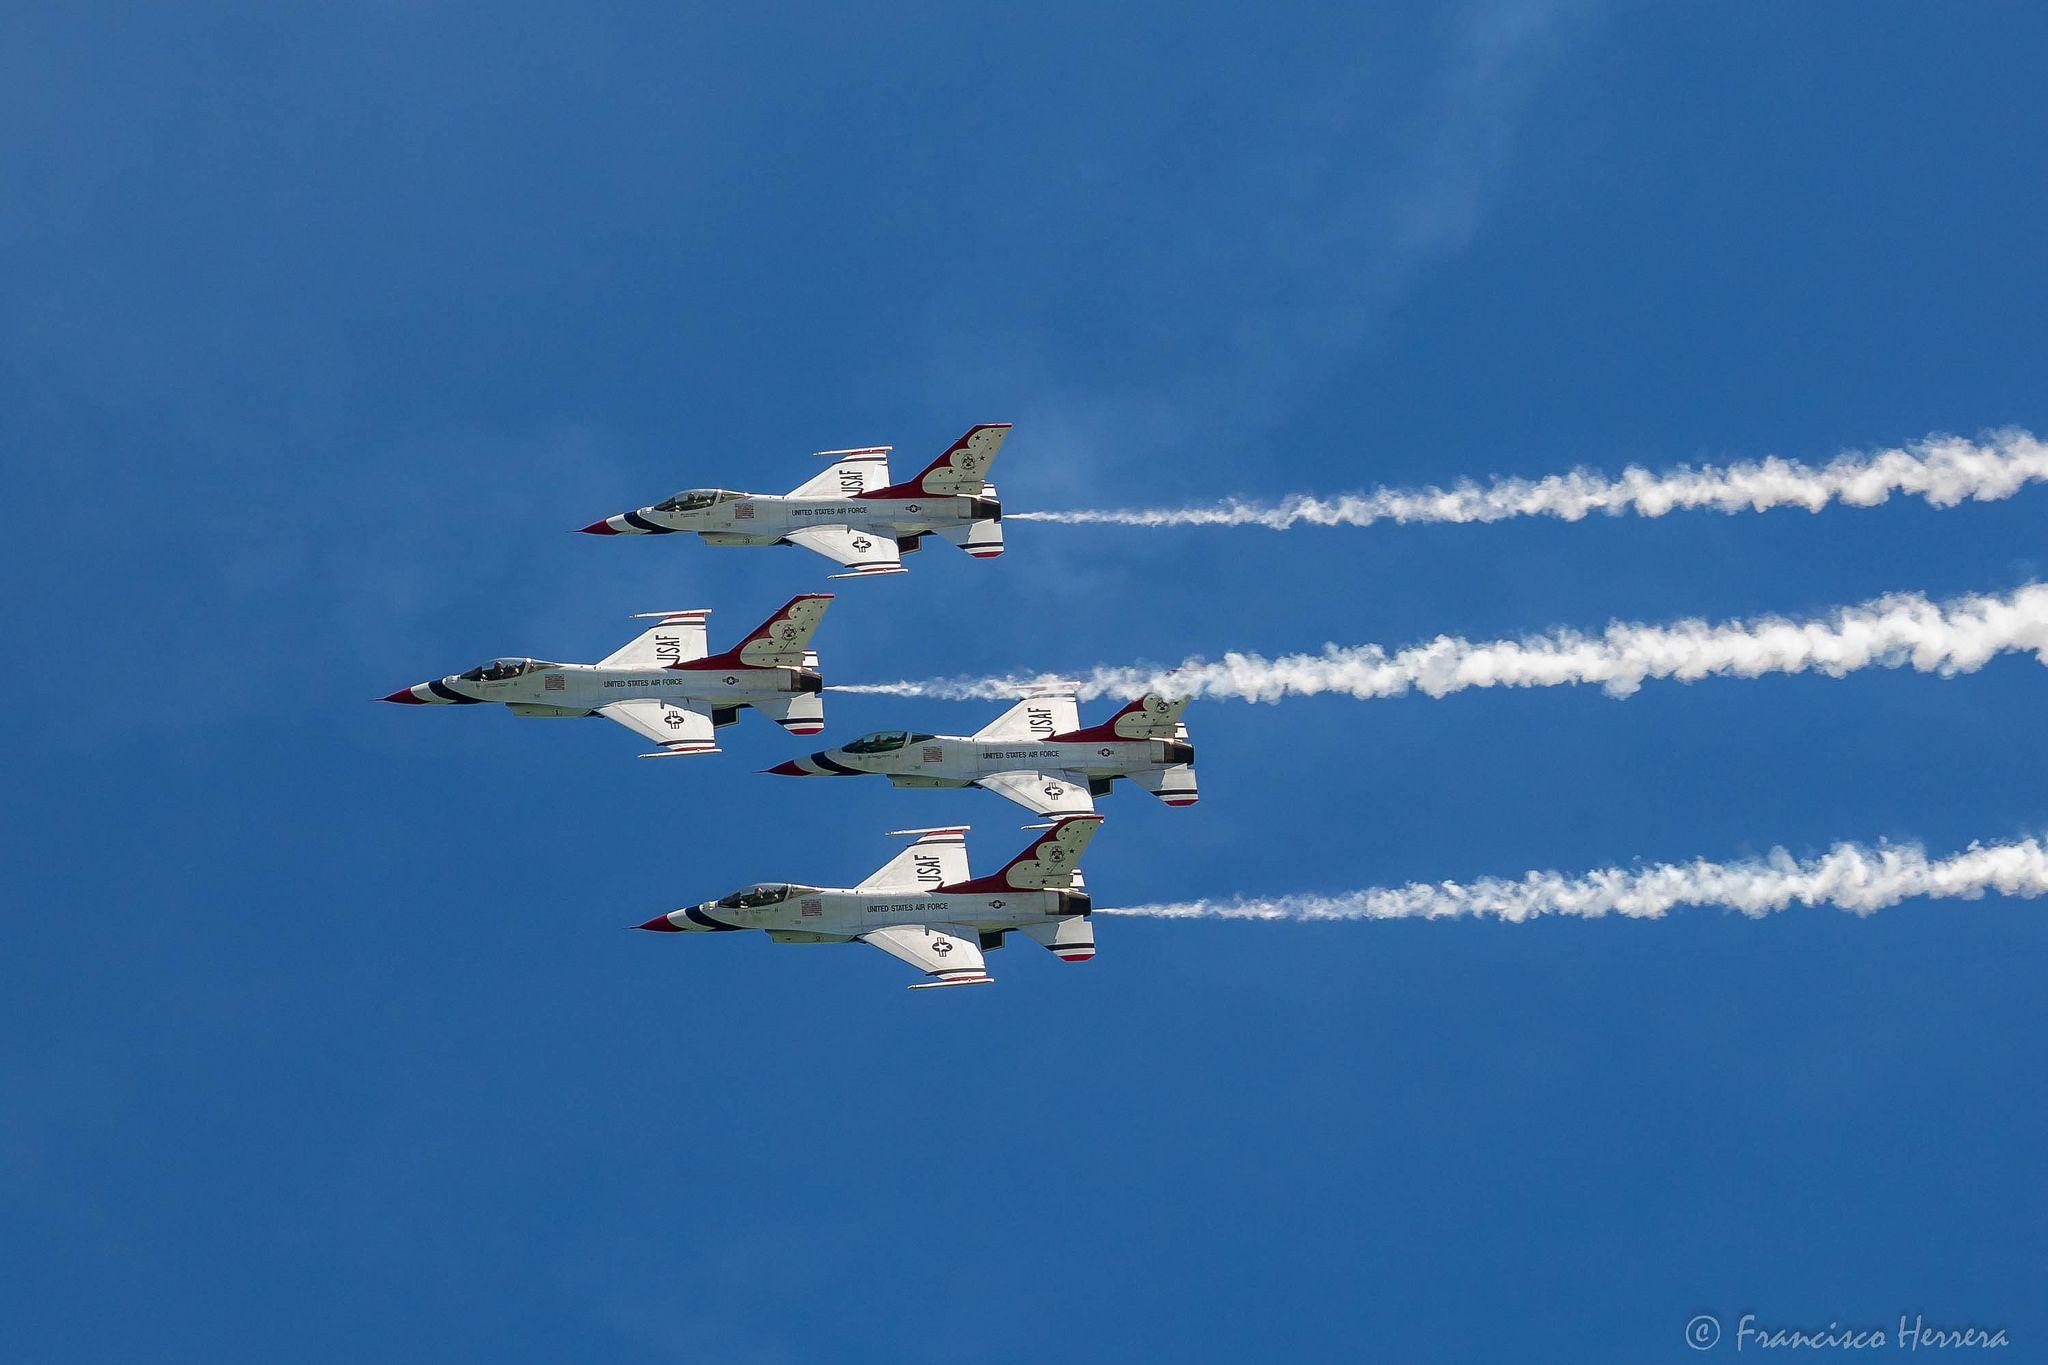 United States Air Force Thunderbirds Air force, Air show